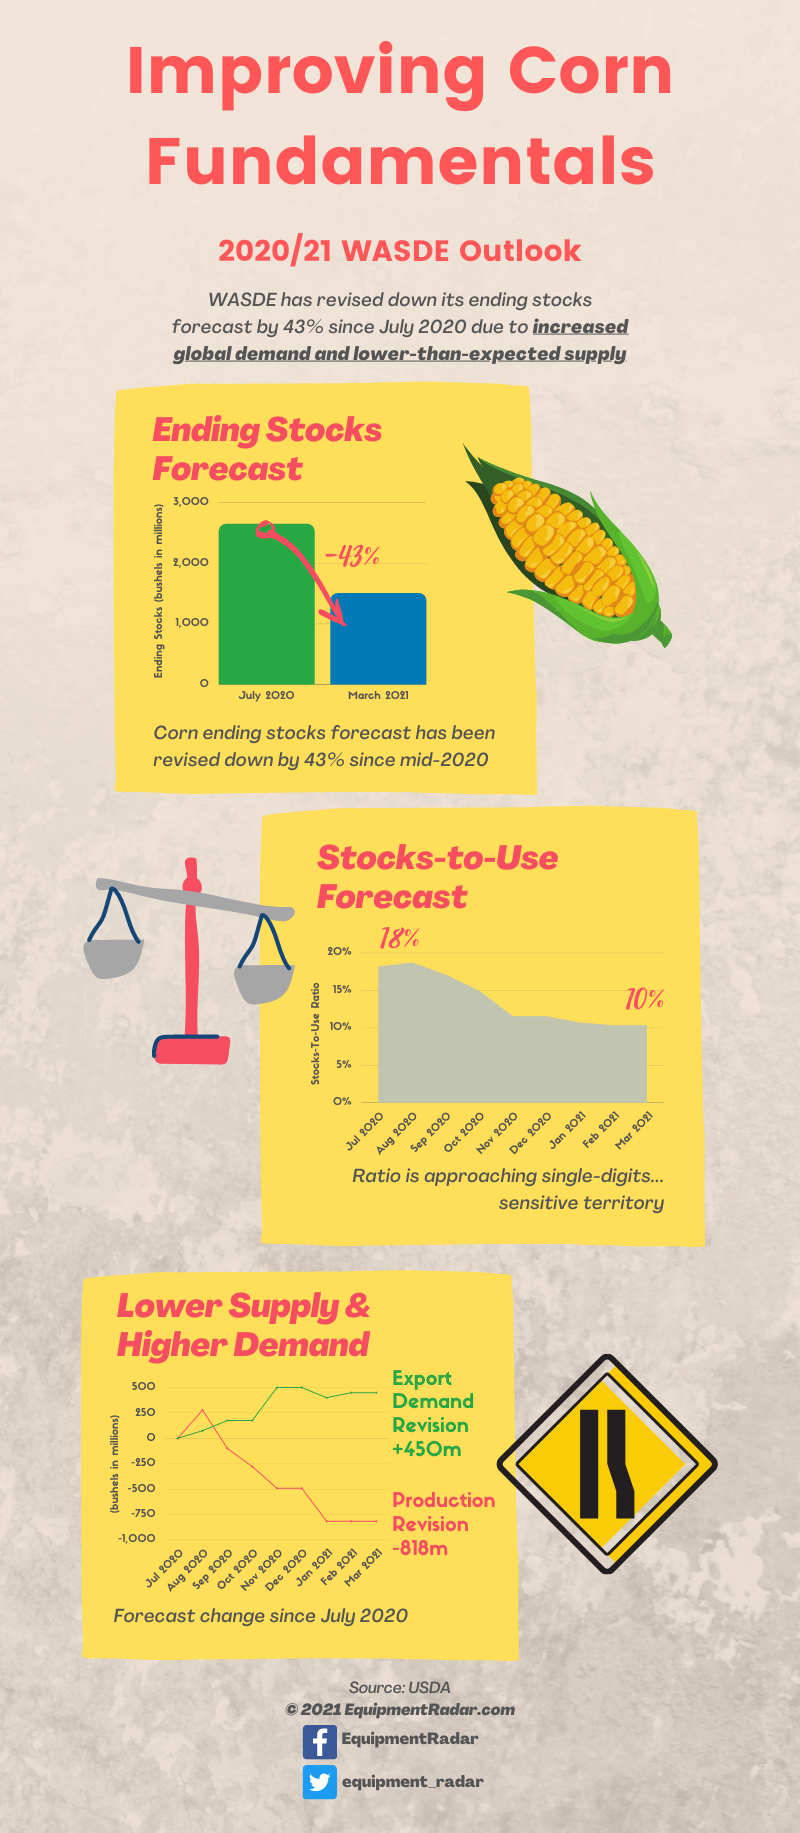 WASDE Corn Fundamentals Are Improving